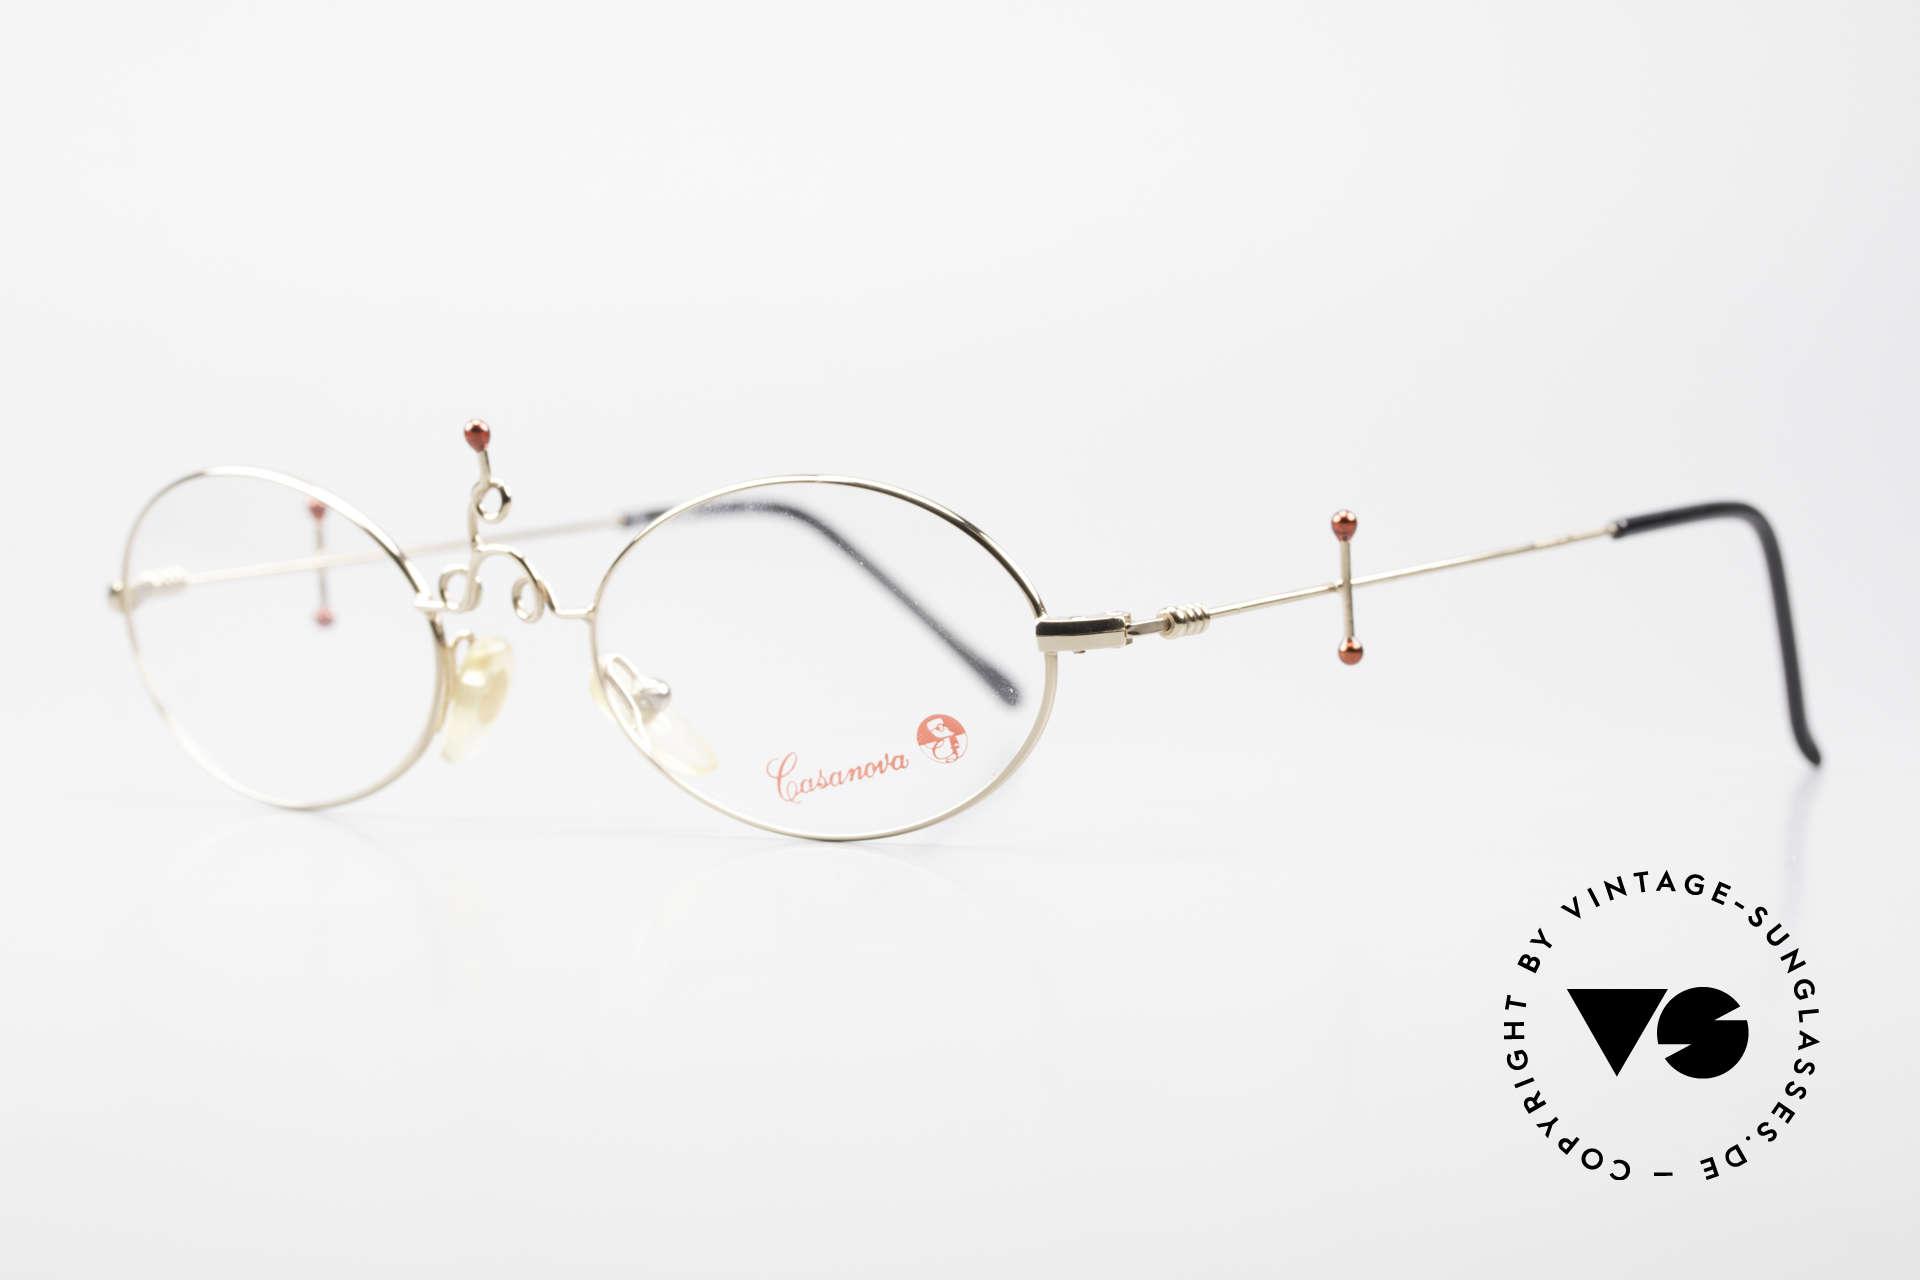 Casanova Arché 1 Art Glasses 80's Gold Plated, Arché Series = most precious creations by CASANOVA, Made for Women